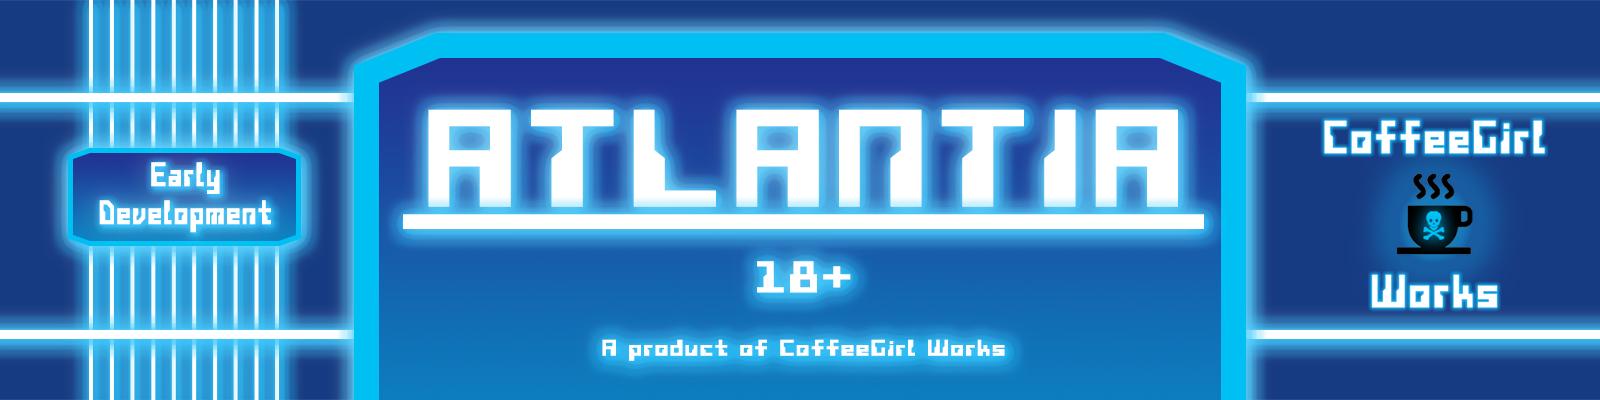 Atlantia - Banner